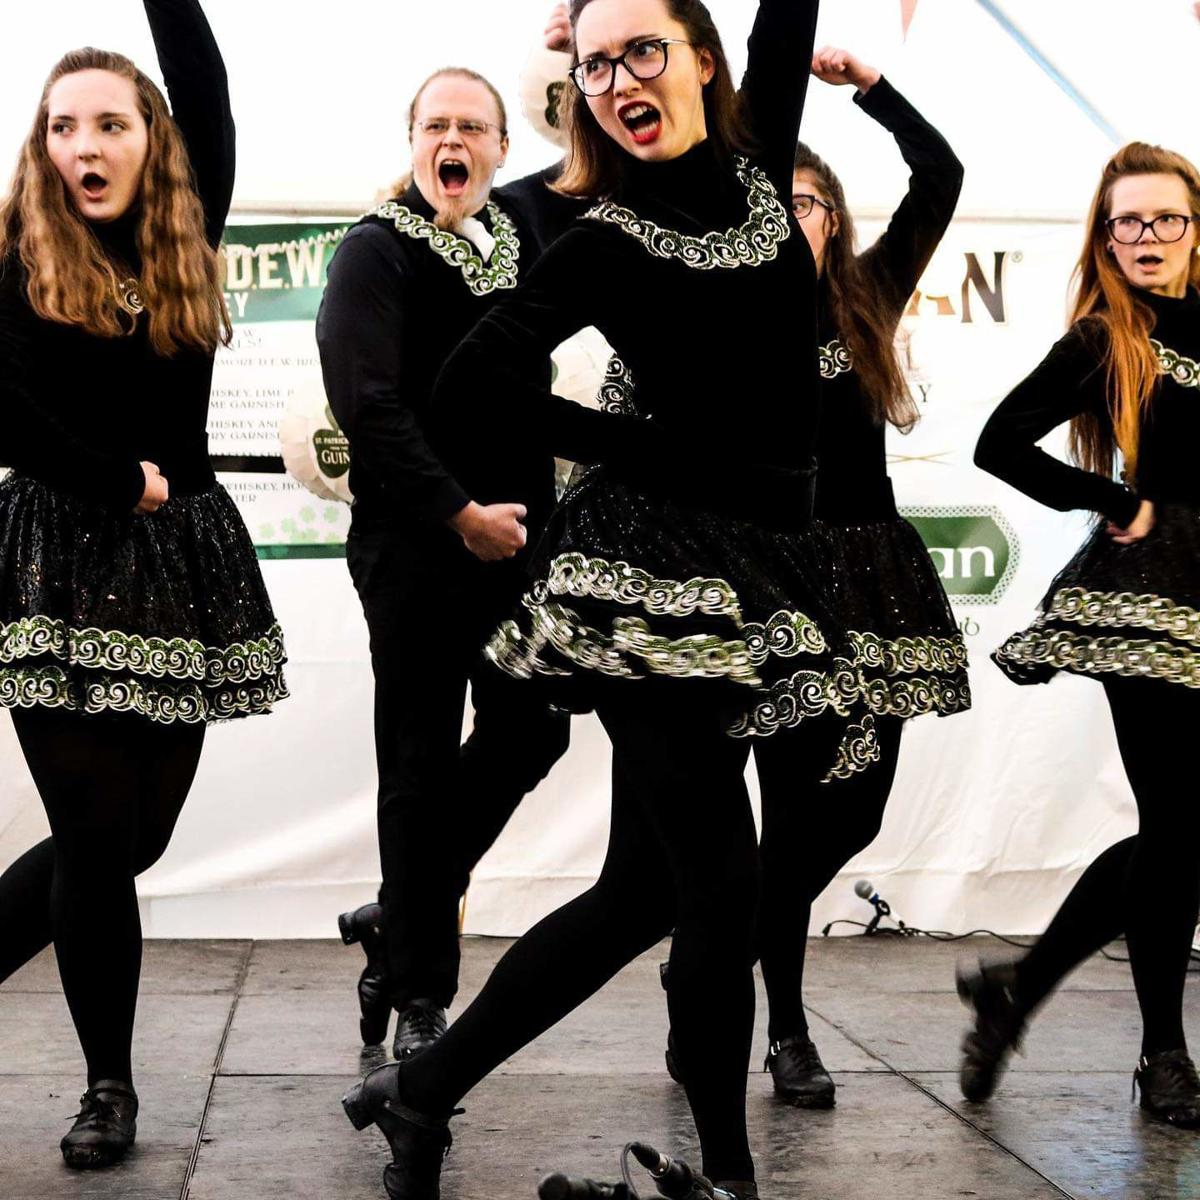 Irish Dance Festival